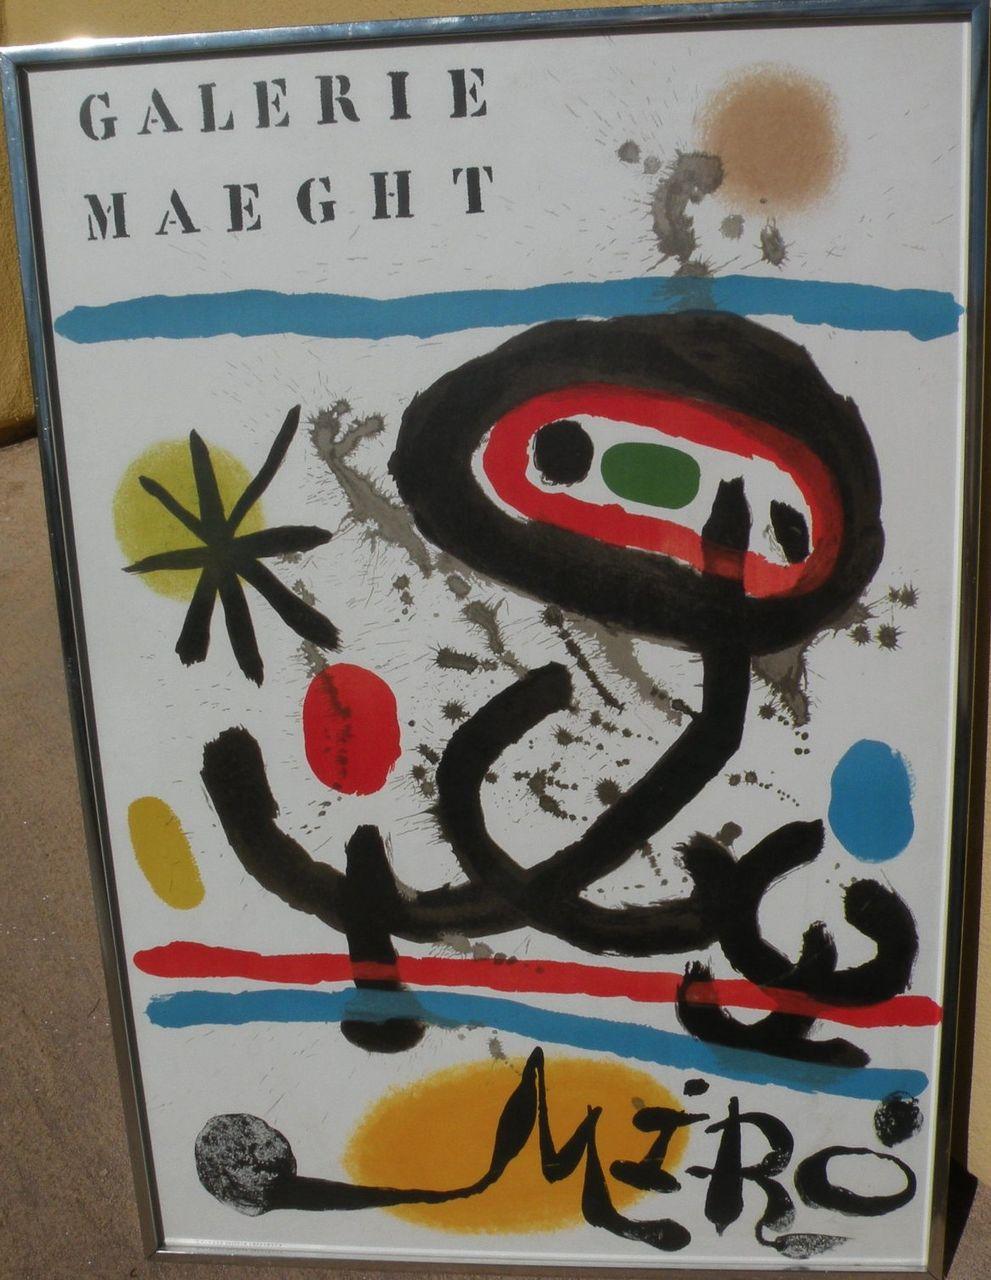 JOAN MIRO (1893-1983) original Galerie Maeght lithograph print